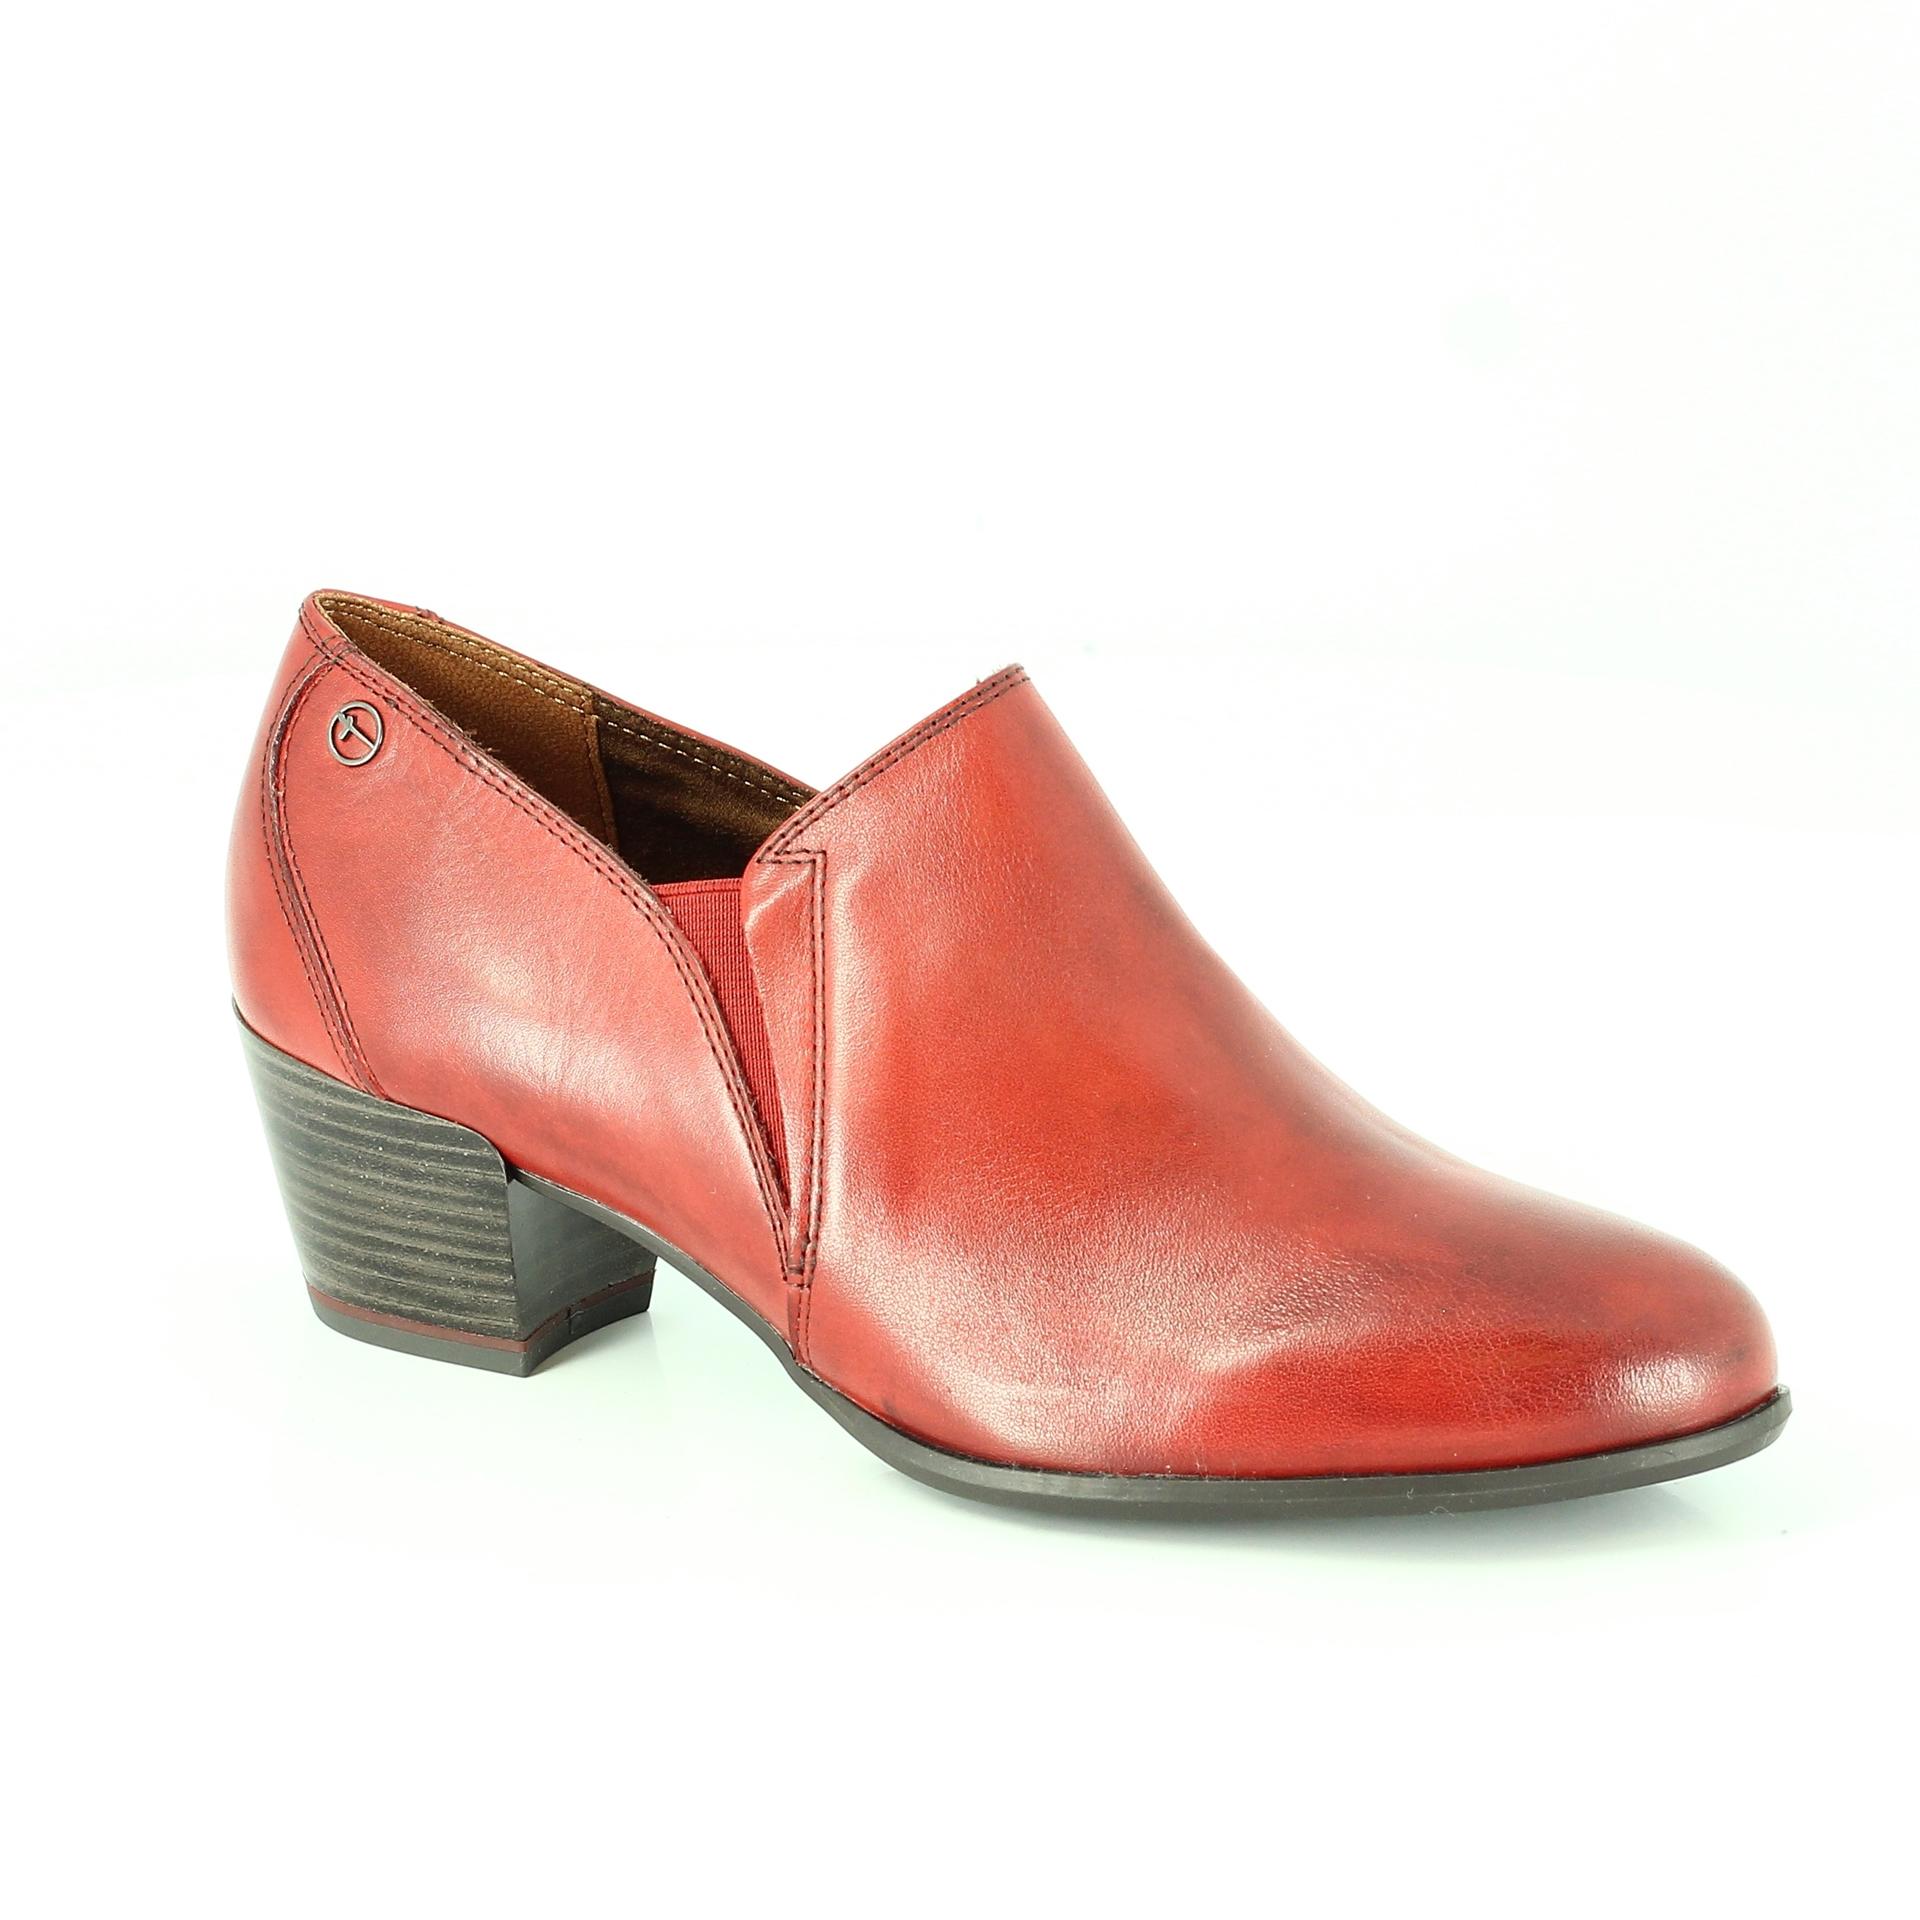 Bercolini Kényelmes cipők Tamaris, női, csizma , bőr